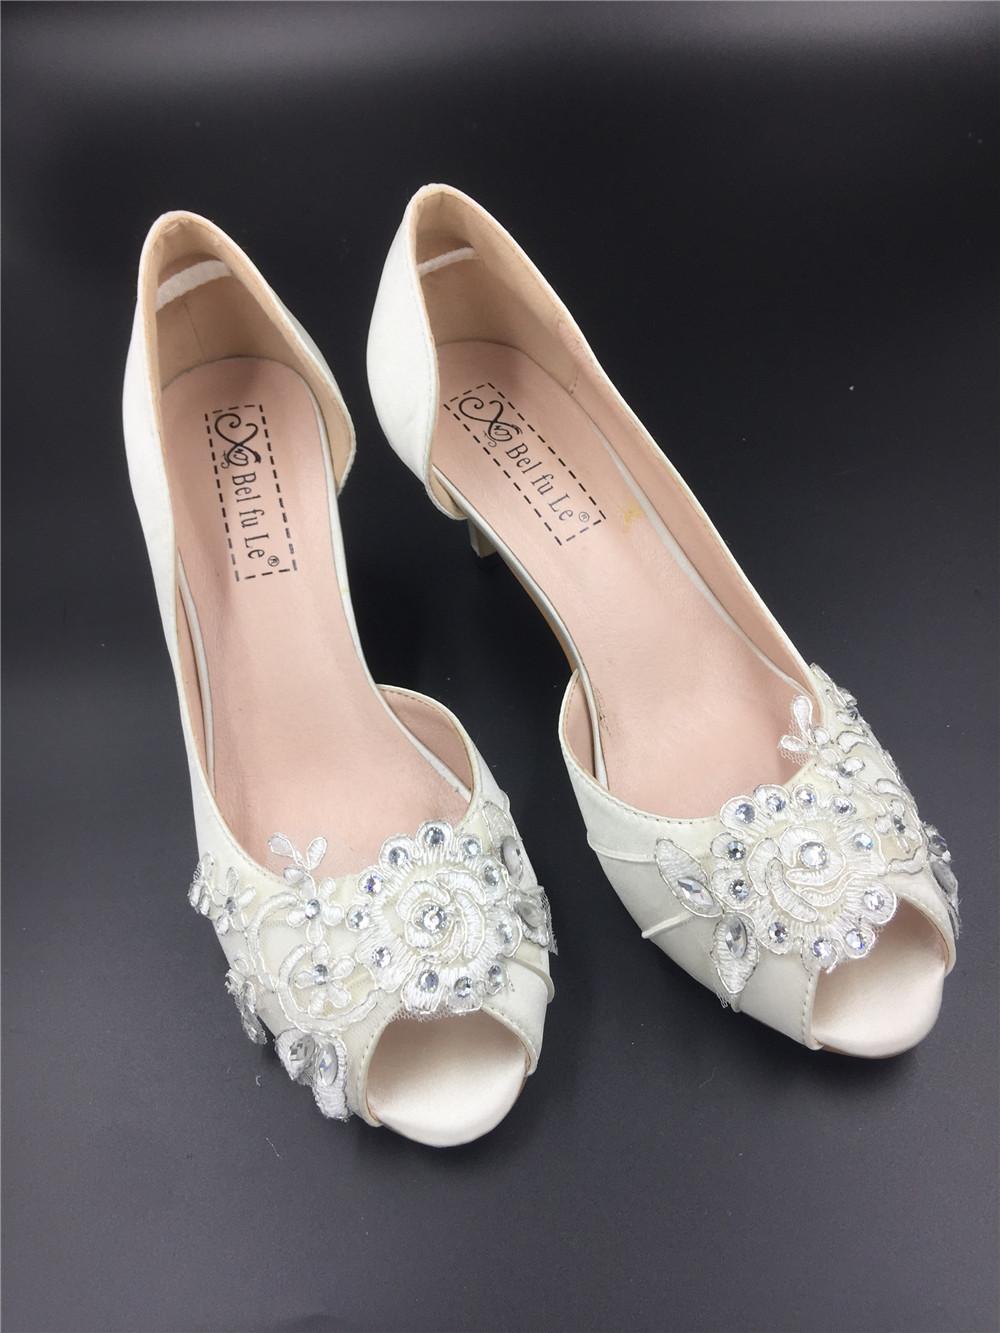 Ivory White Bridal Shoes,Lace Satin Wedding heels Shoes,Pump,Peep Toe Heels image 3